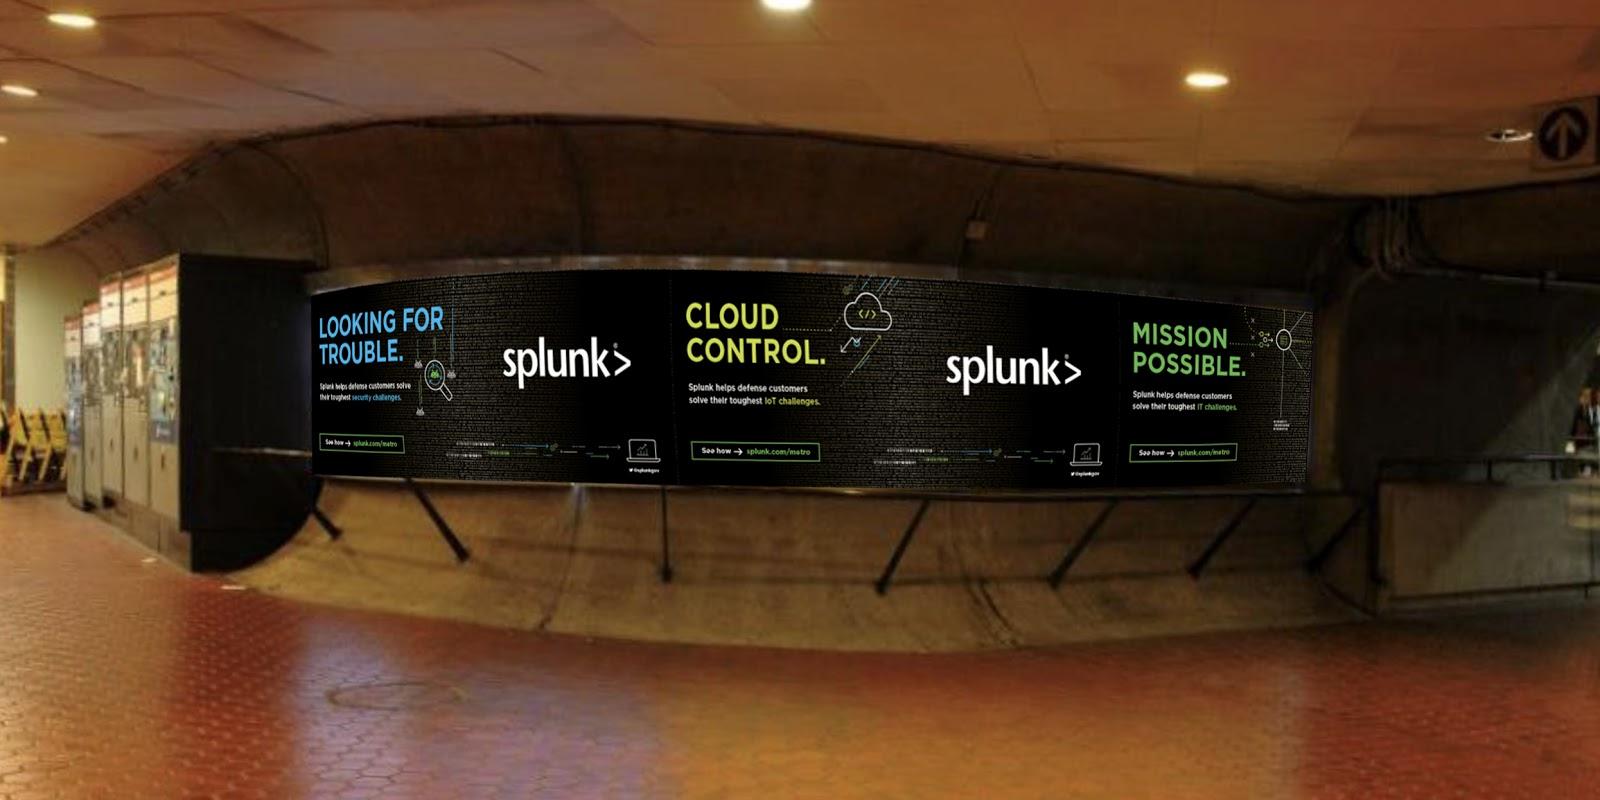 SPLUNK-DC-Metro-Pentagon-Station_Takeover-47.5x313.jpg